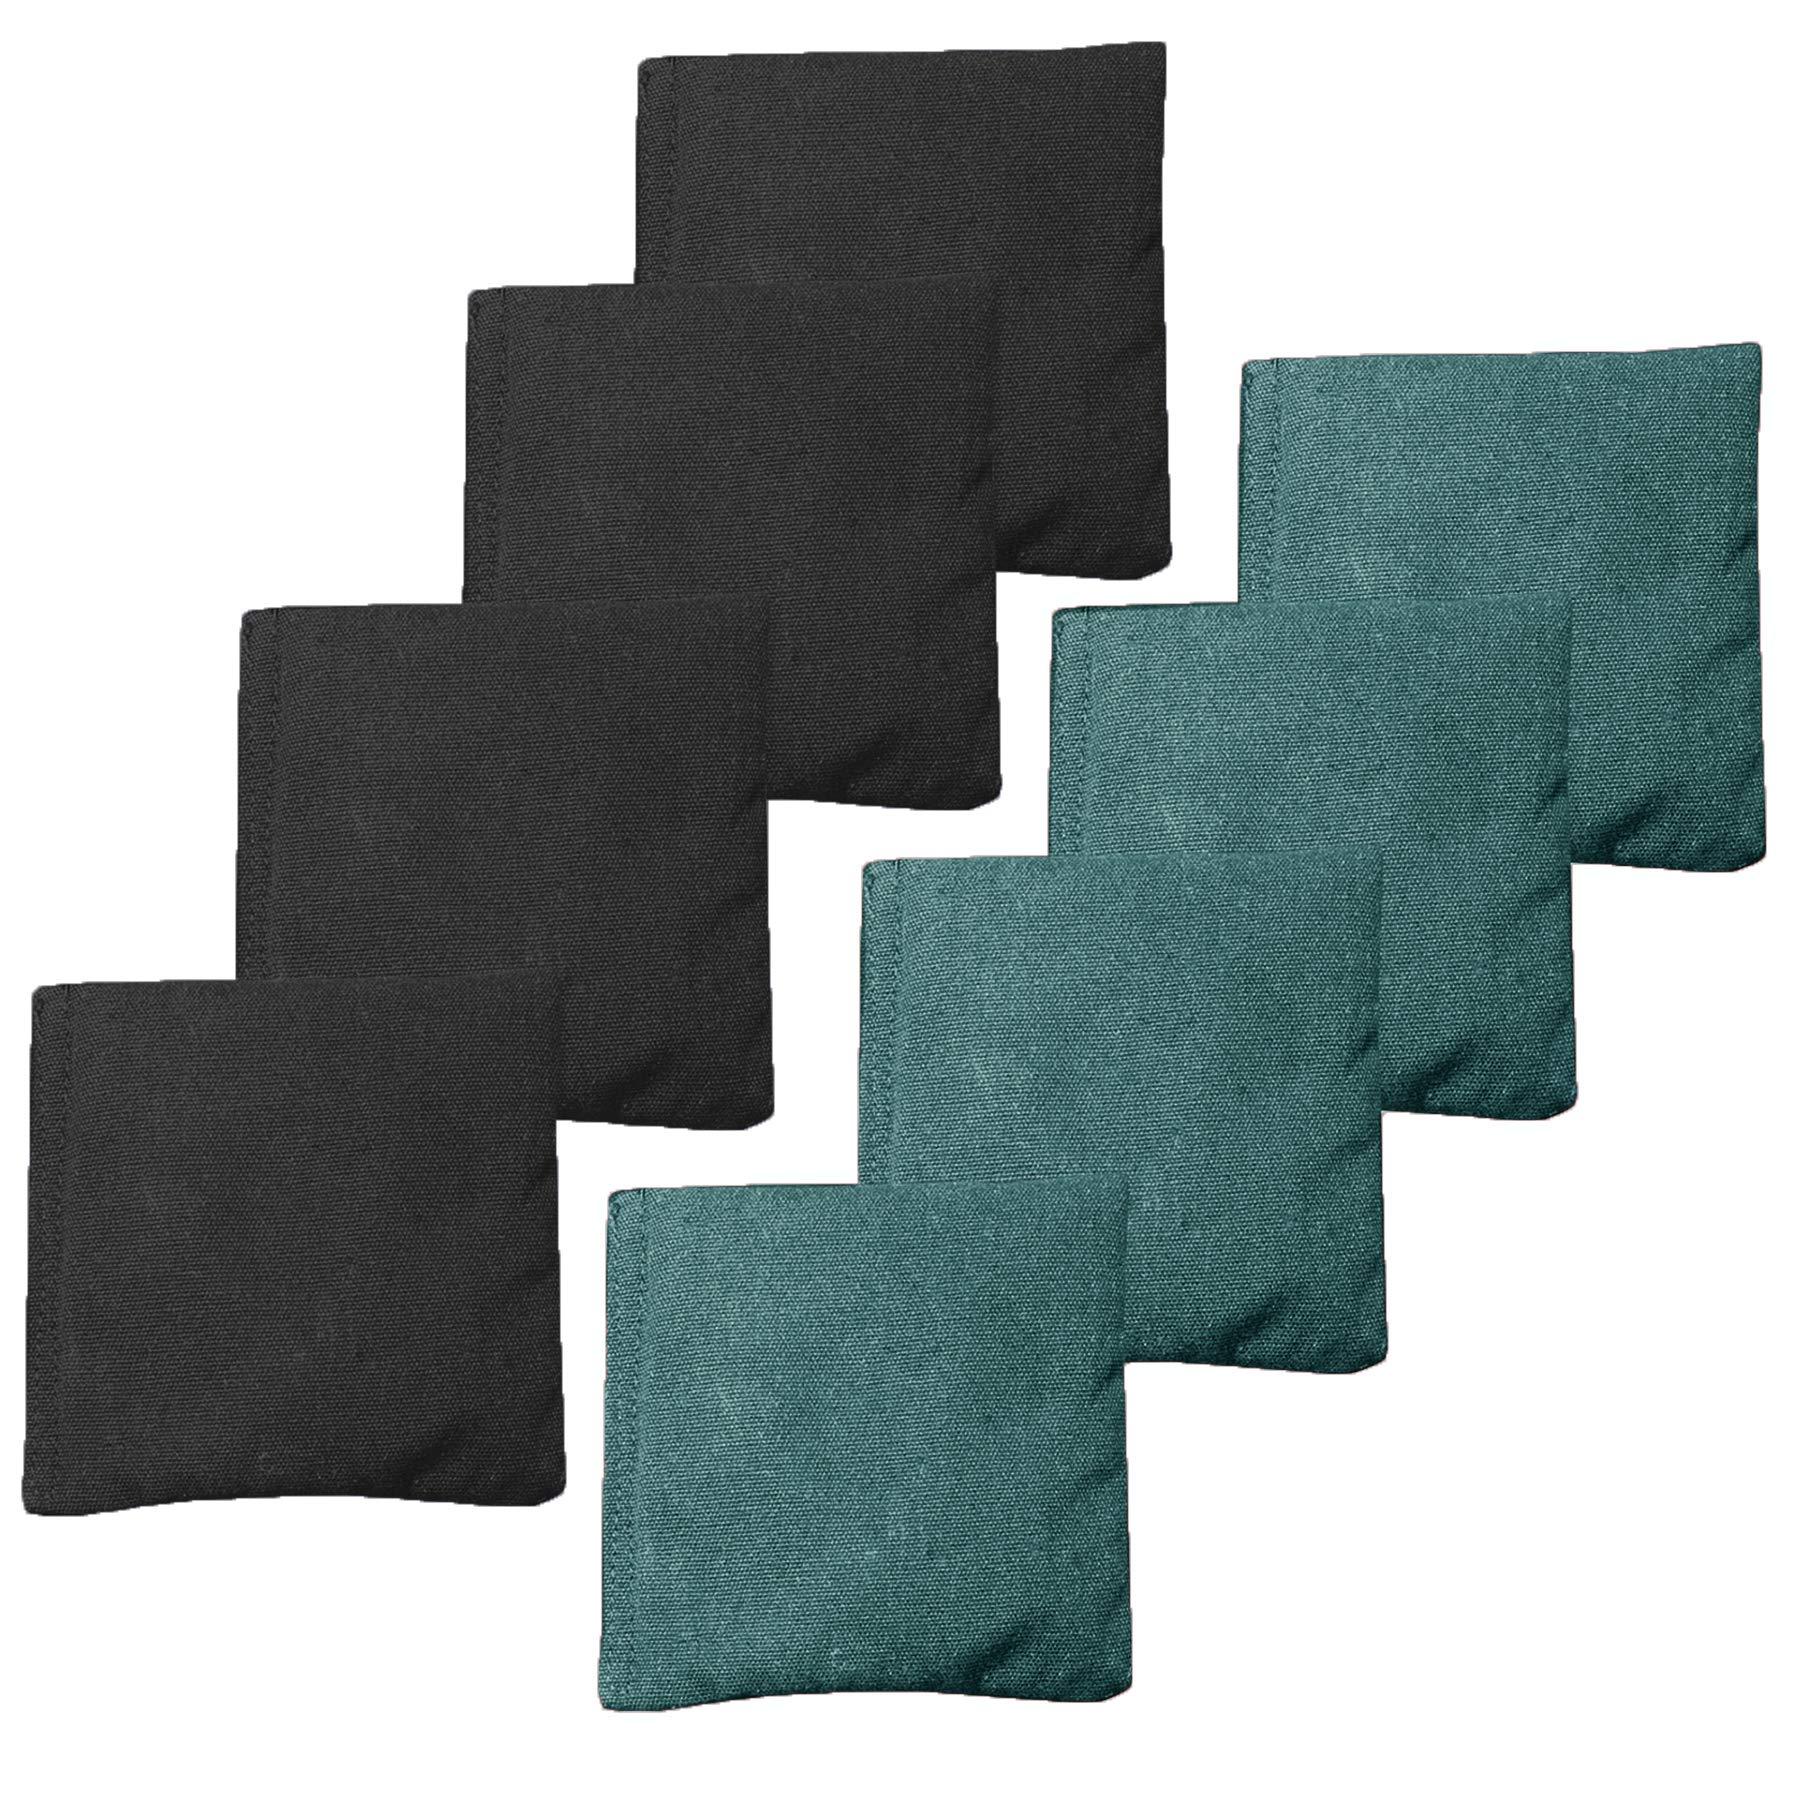 All Weather Cornhole Bean Bags Set of 8 - Duck Cloth, Regulation Size & Weight - Hunter Green & Black